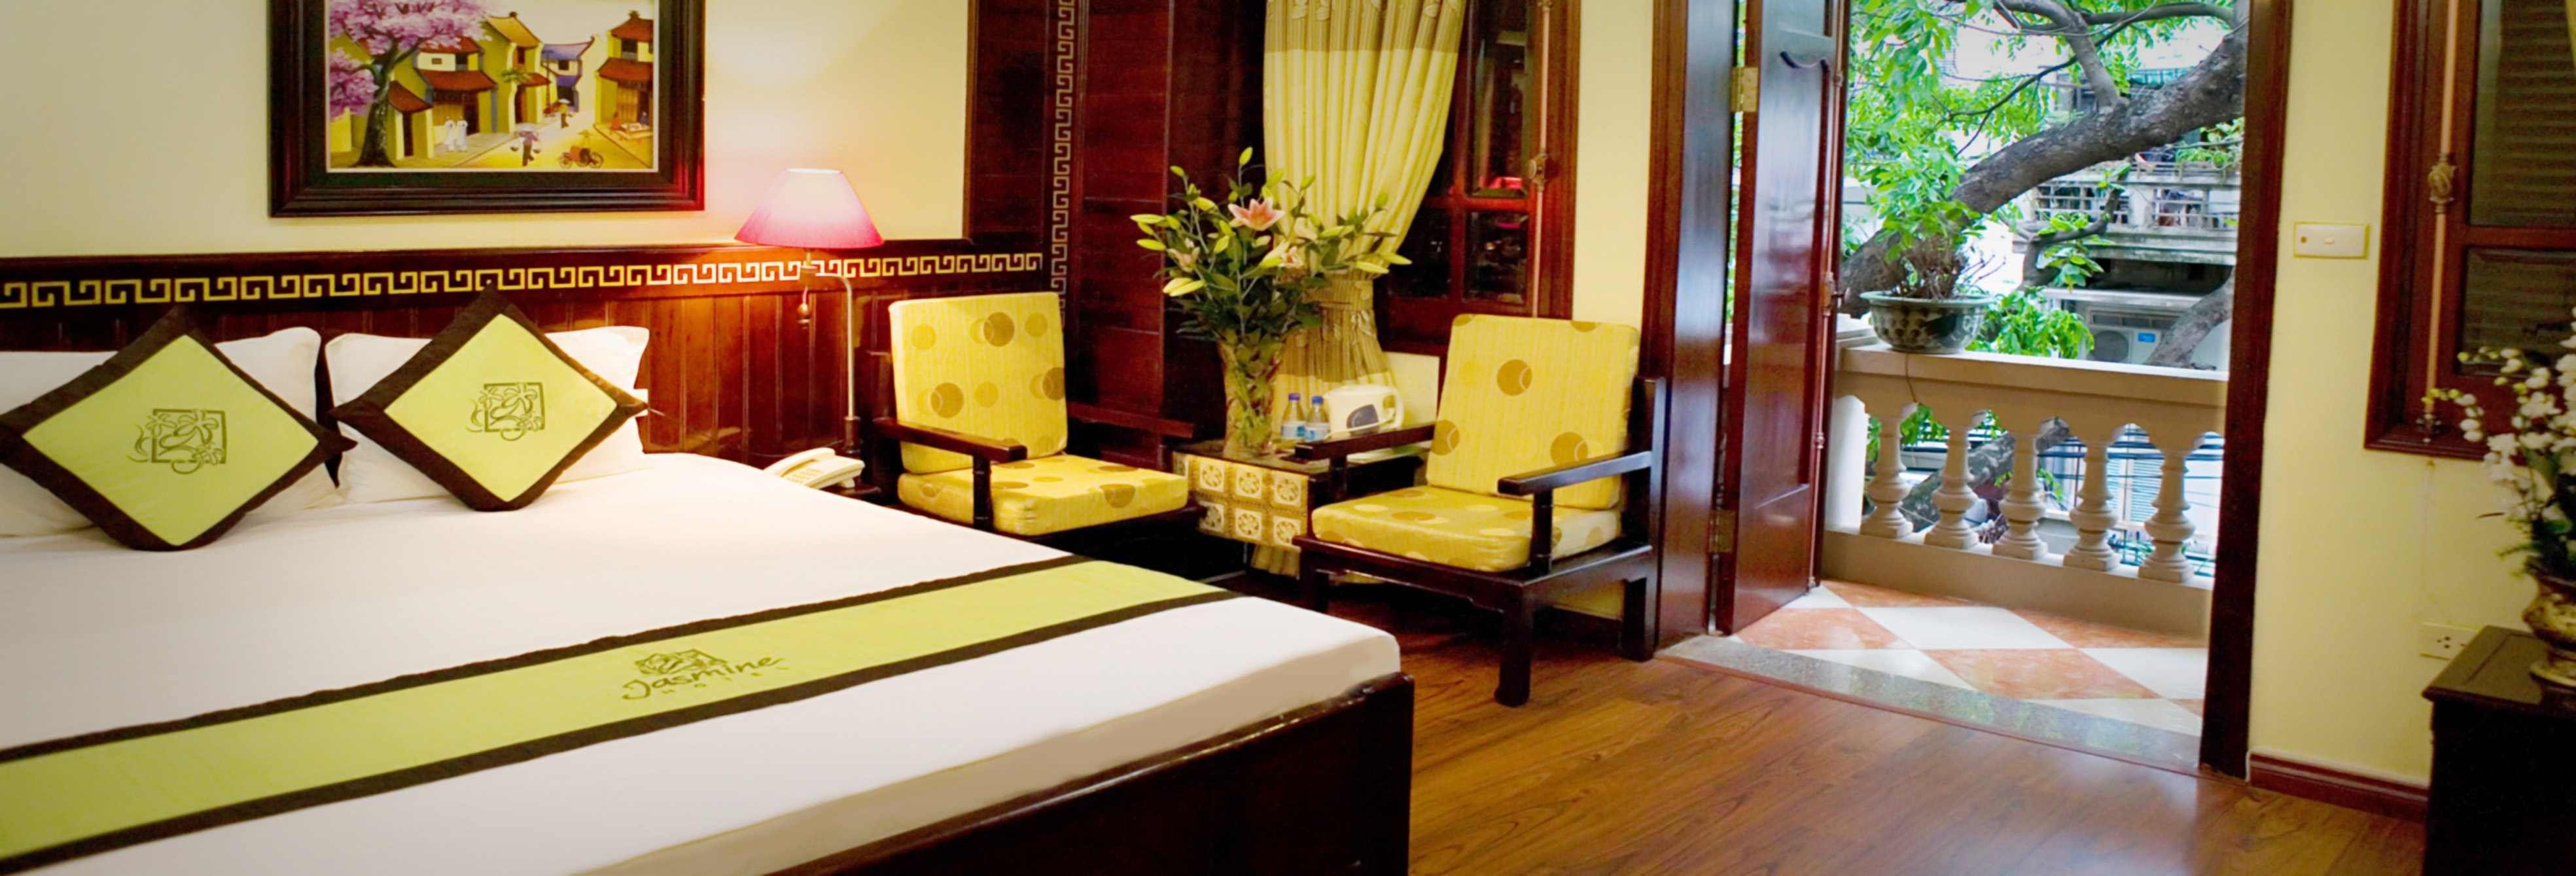 Best Hotels In Hanoi Vietnam 3 Star Old Quarter The Jasmine Hotel 30 Rooms Central